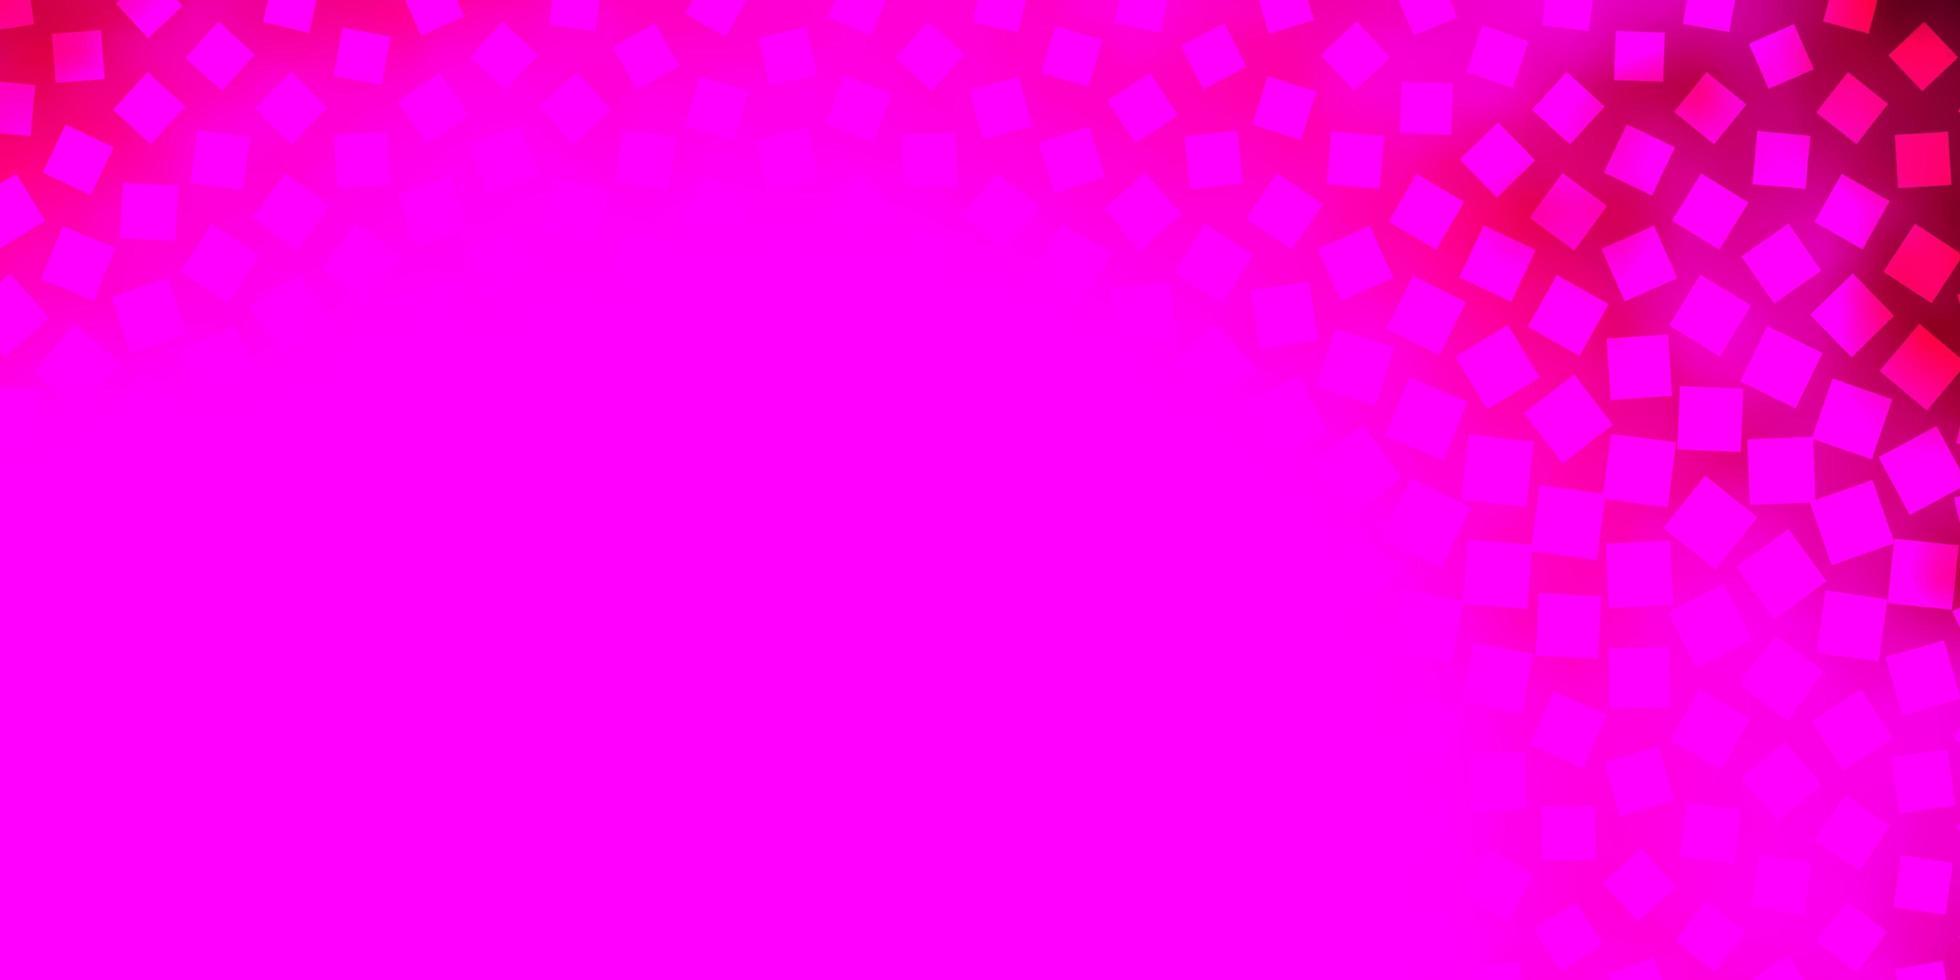 ljusrosa vektorbakgrund med rektanglar. vektor